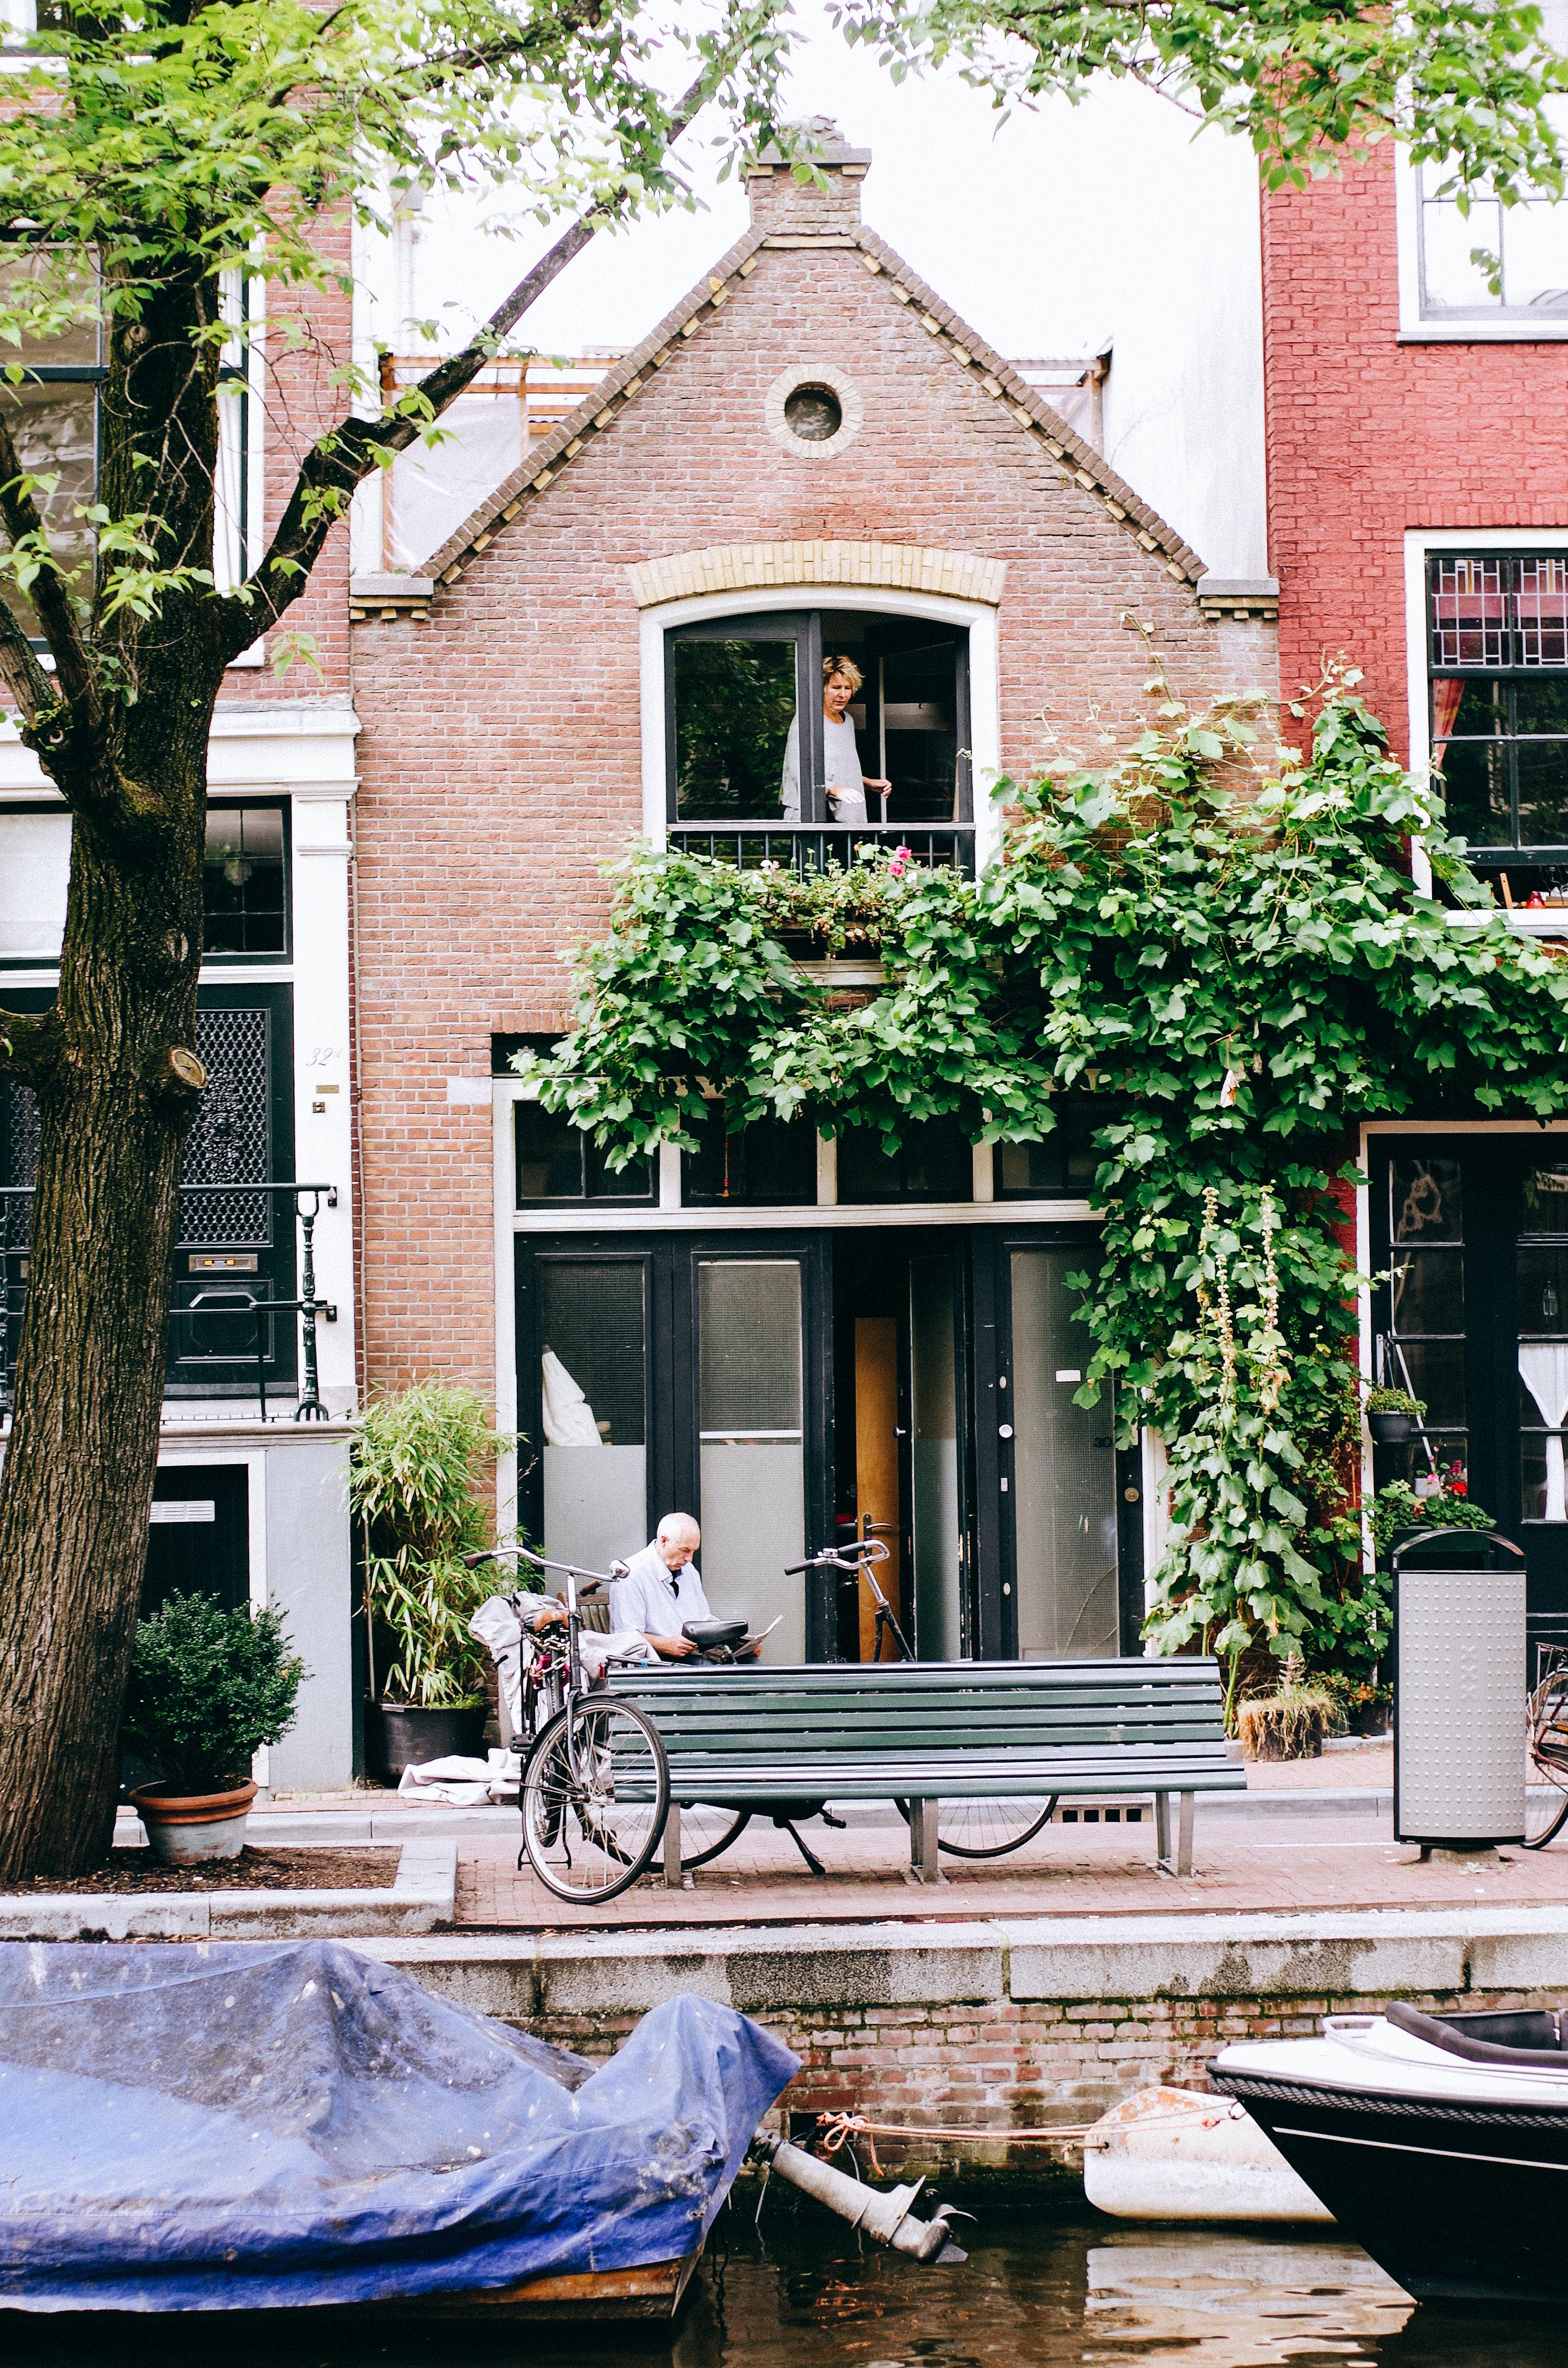 2016 JUL Amsterdam Jordaan-5